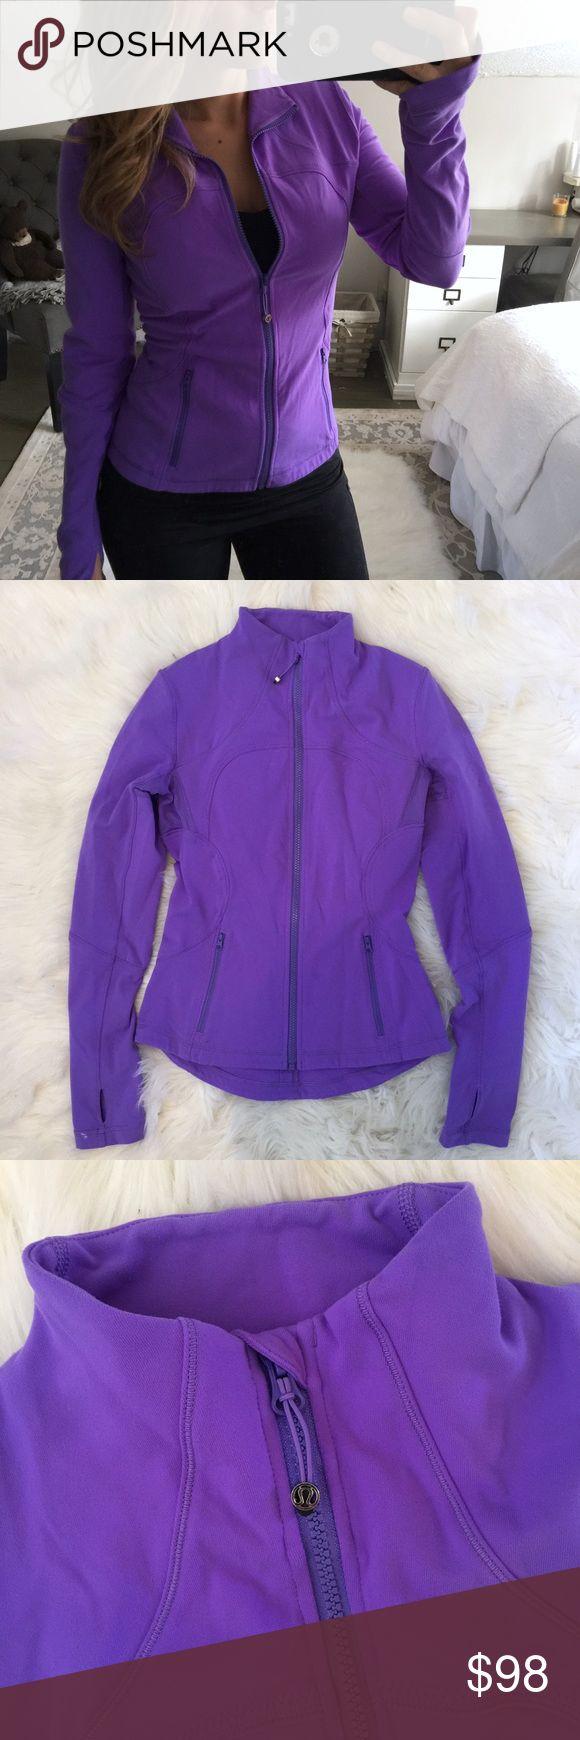 Purple lululemon define zip up jacket sz 6 Lululemon - Pretty purple zip up define jacket - like new - sz 6 lululemon athletica Jackets & Coats